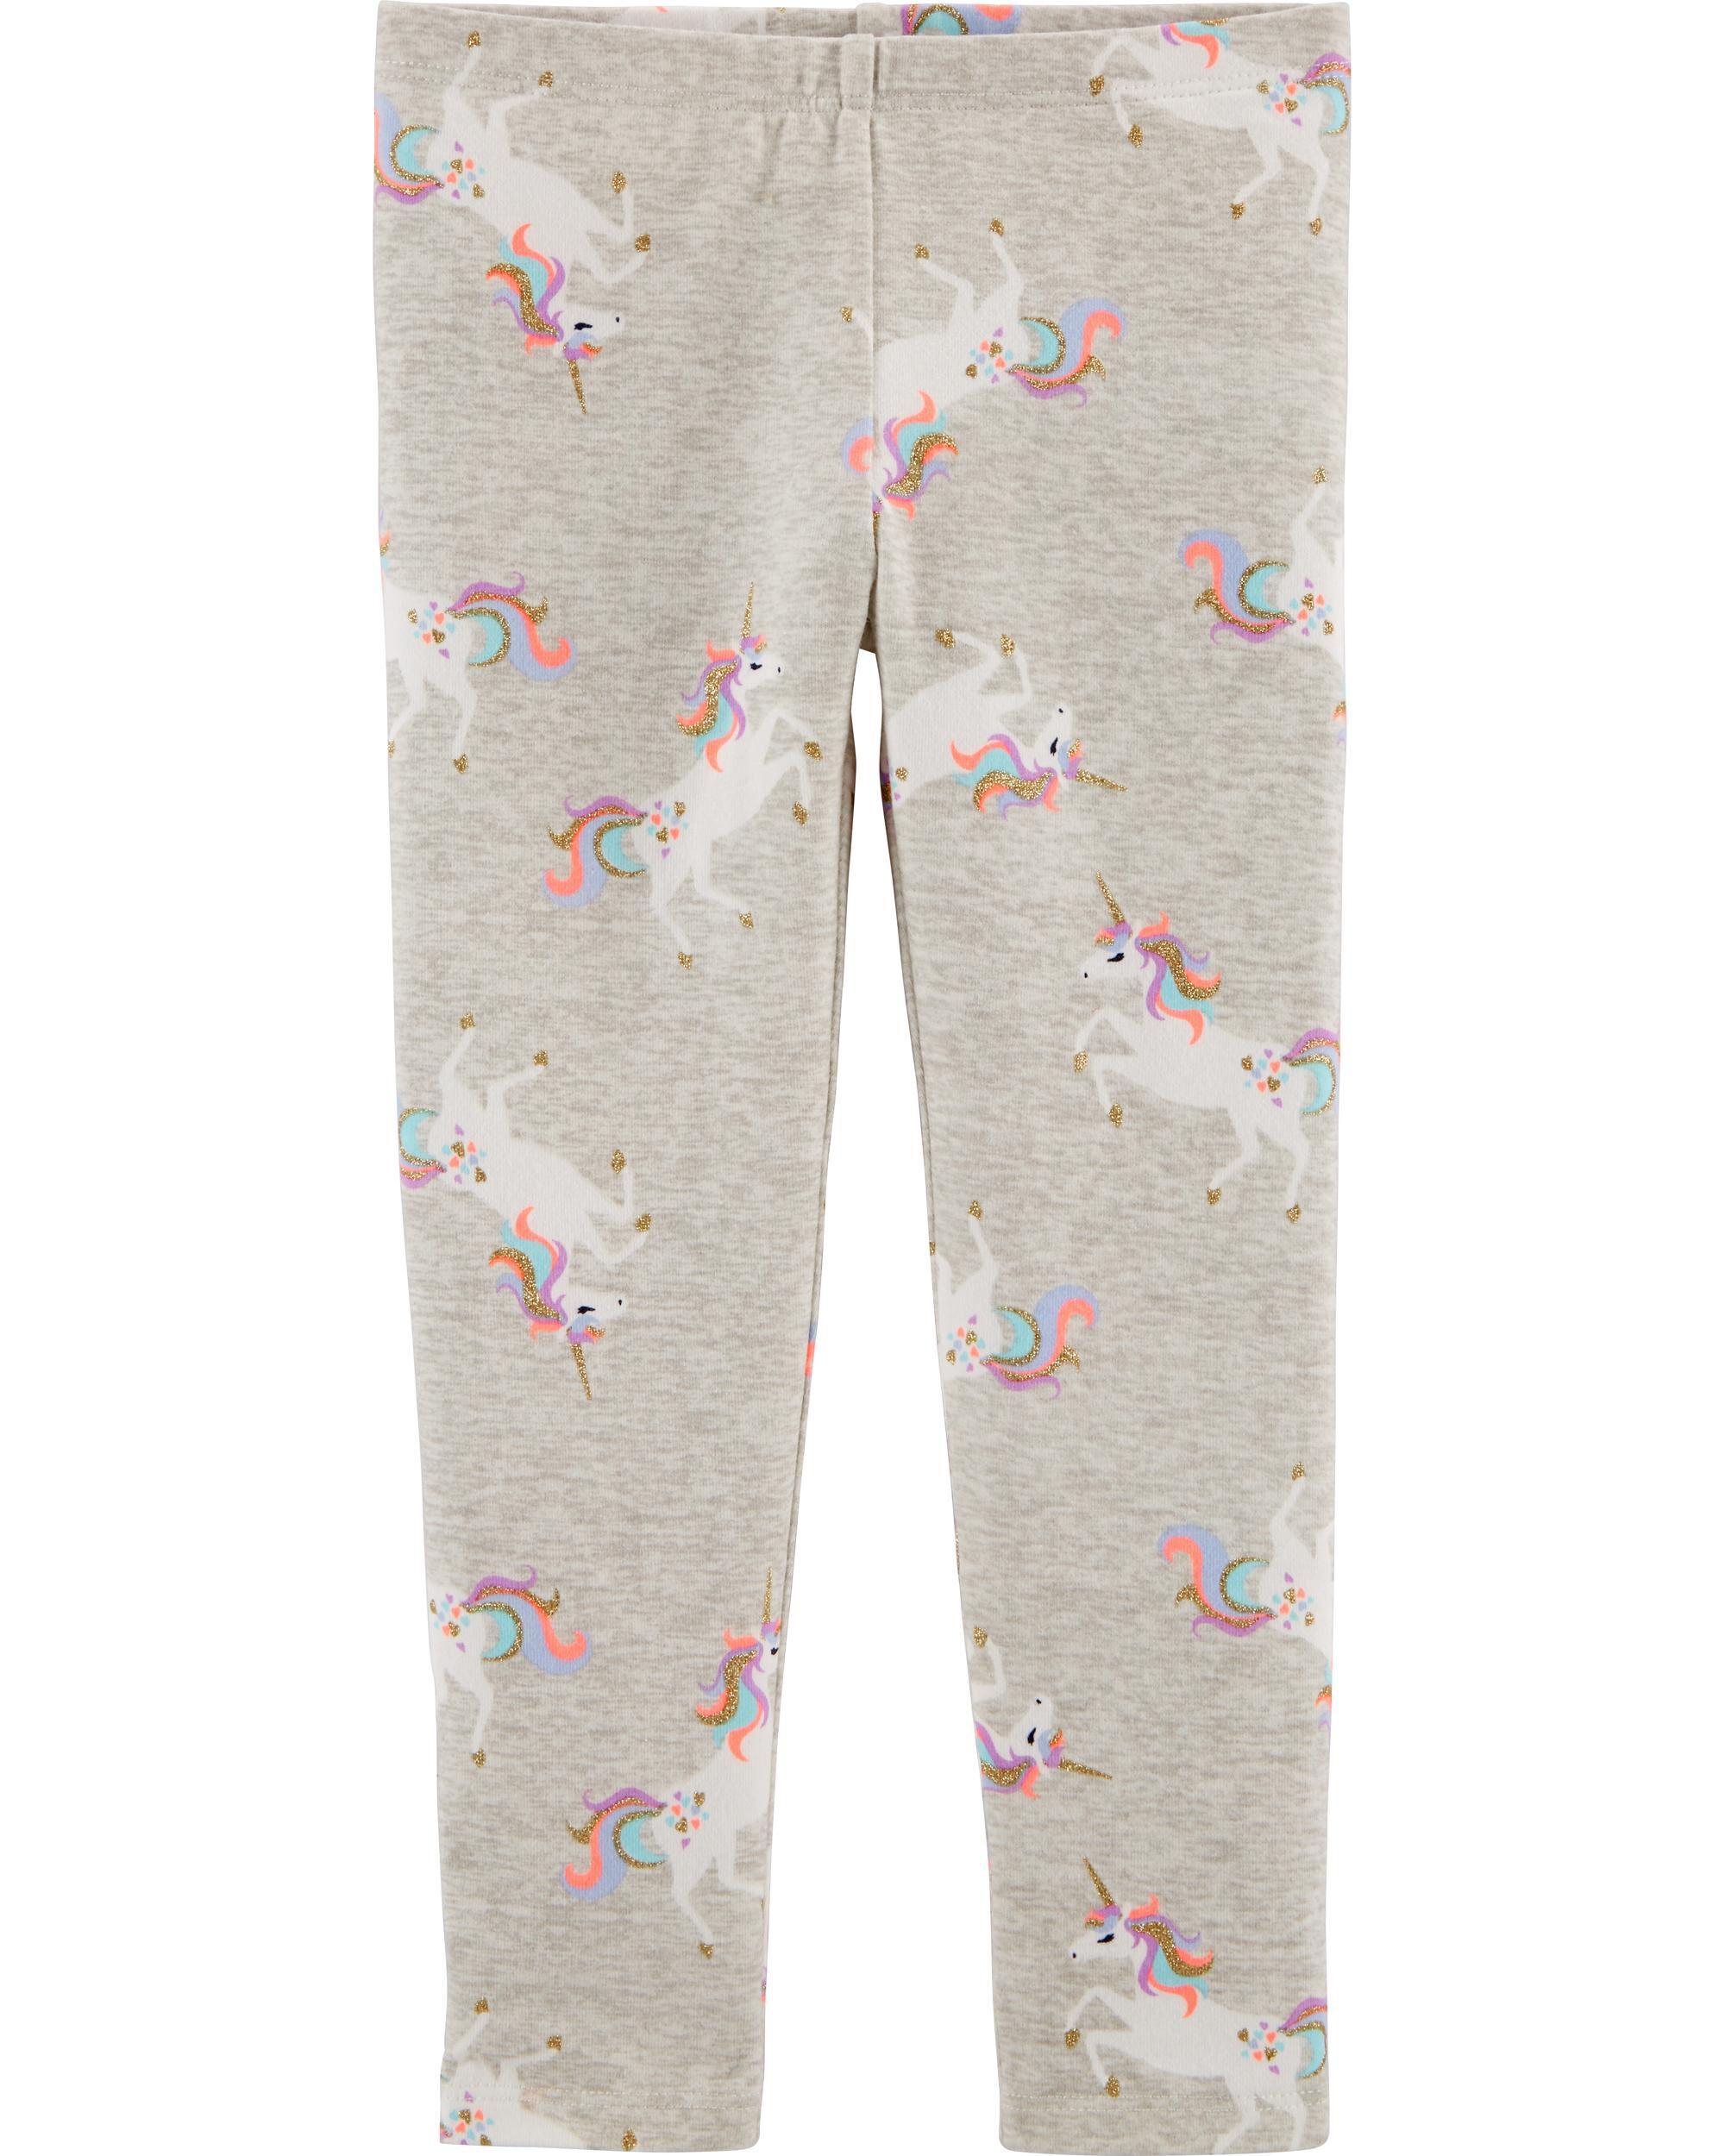 *CLEARANCE* Unicorn Jersey Leggings